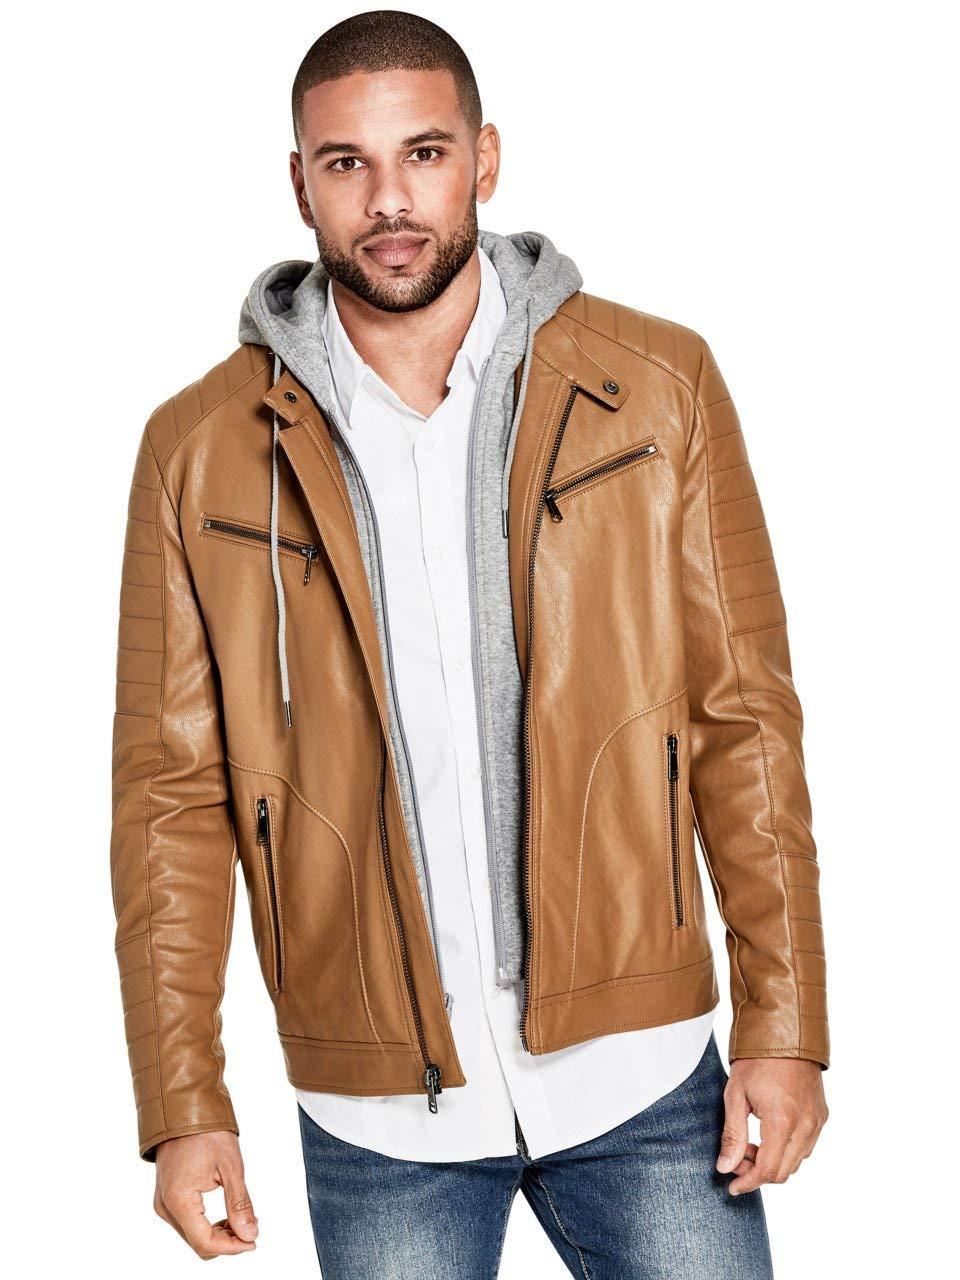 GUESS Factory Men's Kenzo Hooded Moto Jacket